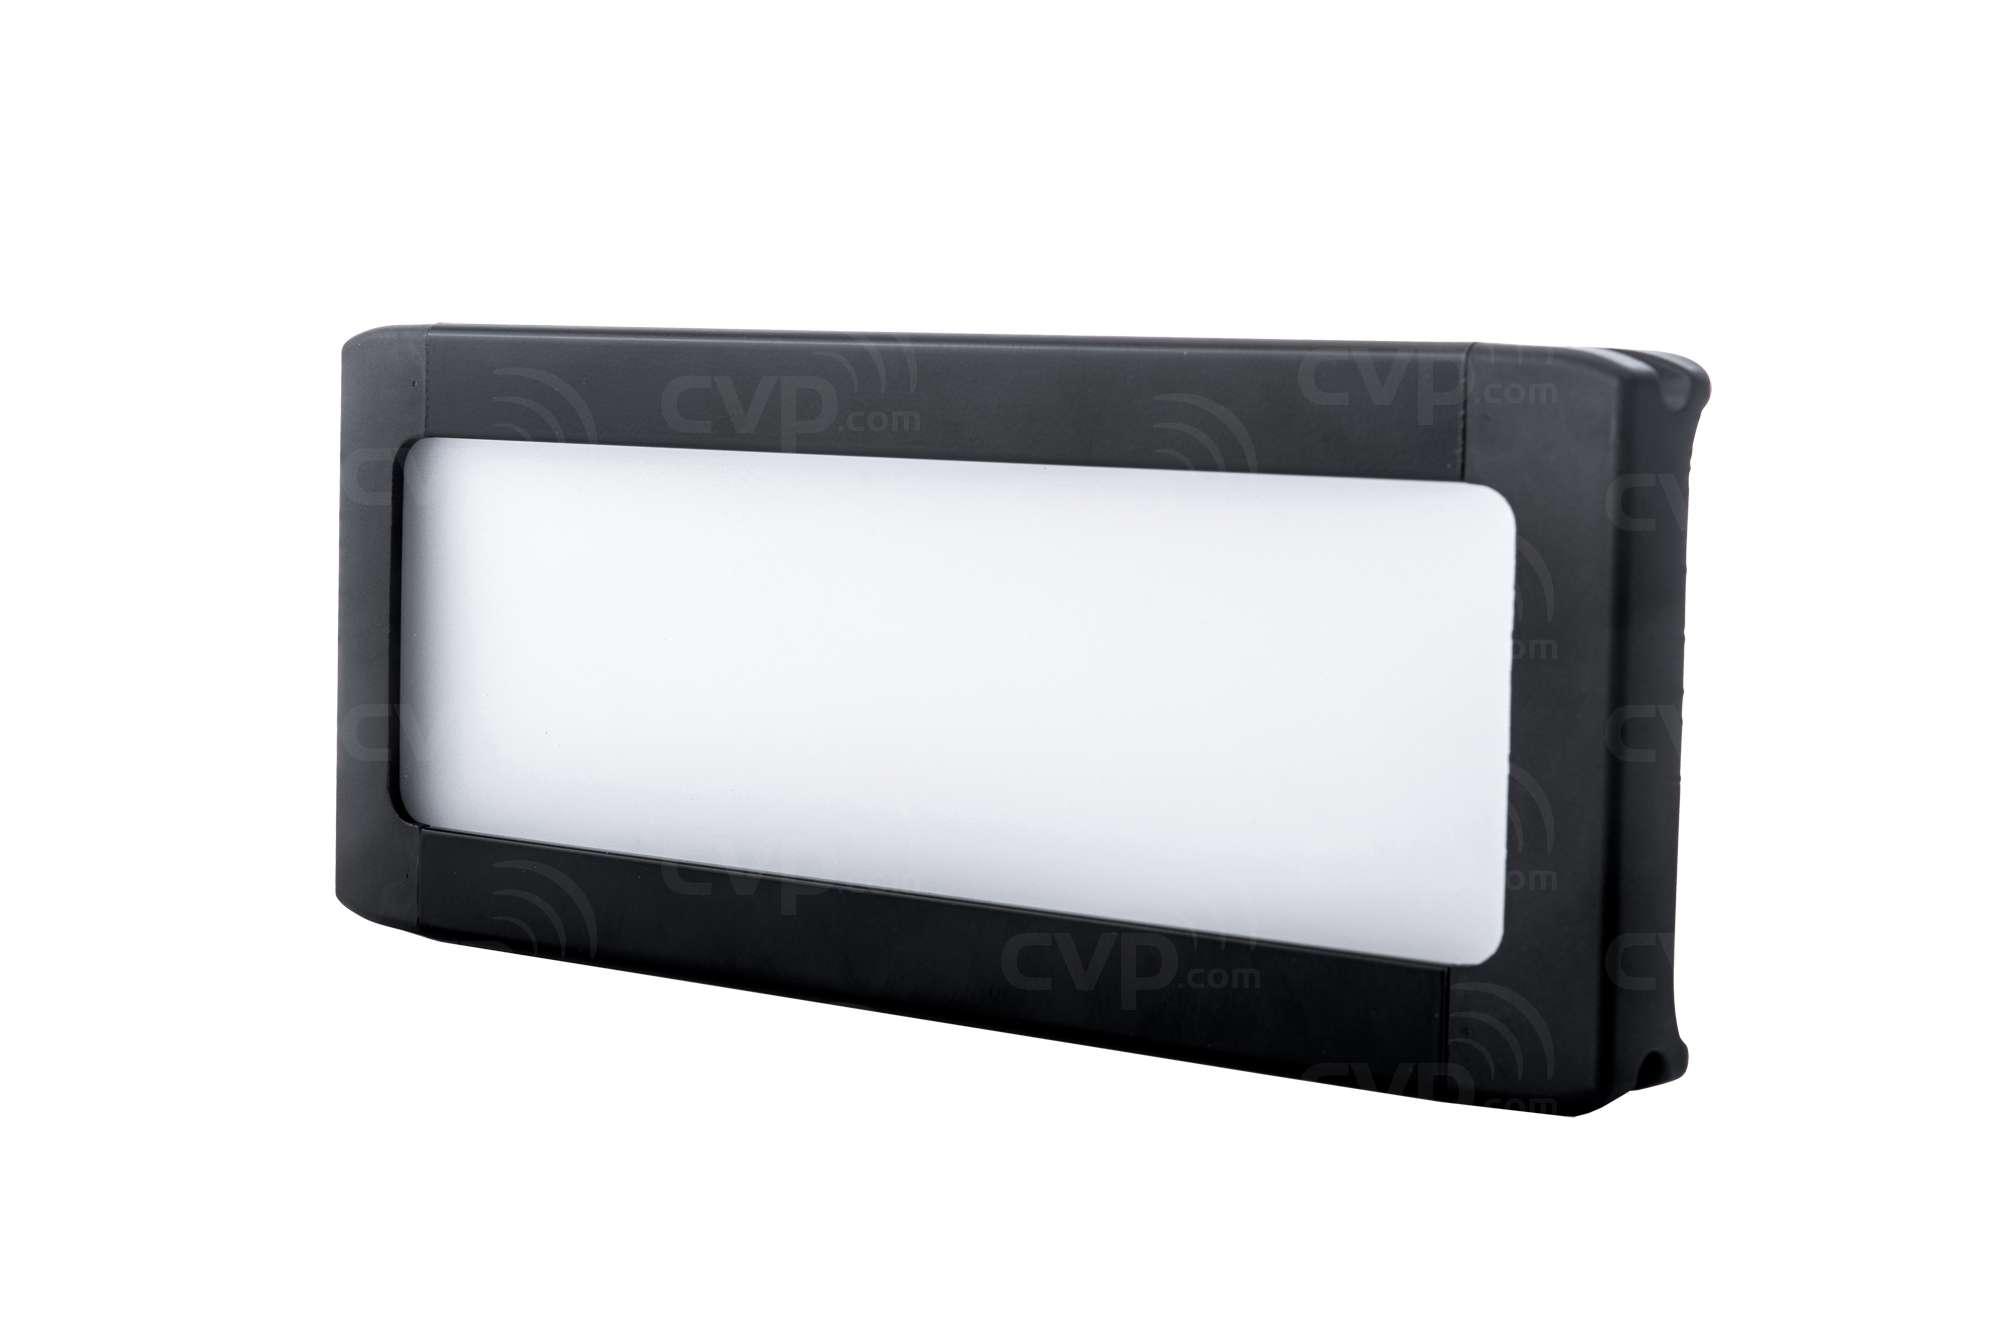 Litepanels Soft Diffusion Frame for the Brick Bi-Colour LED Light